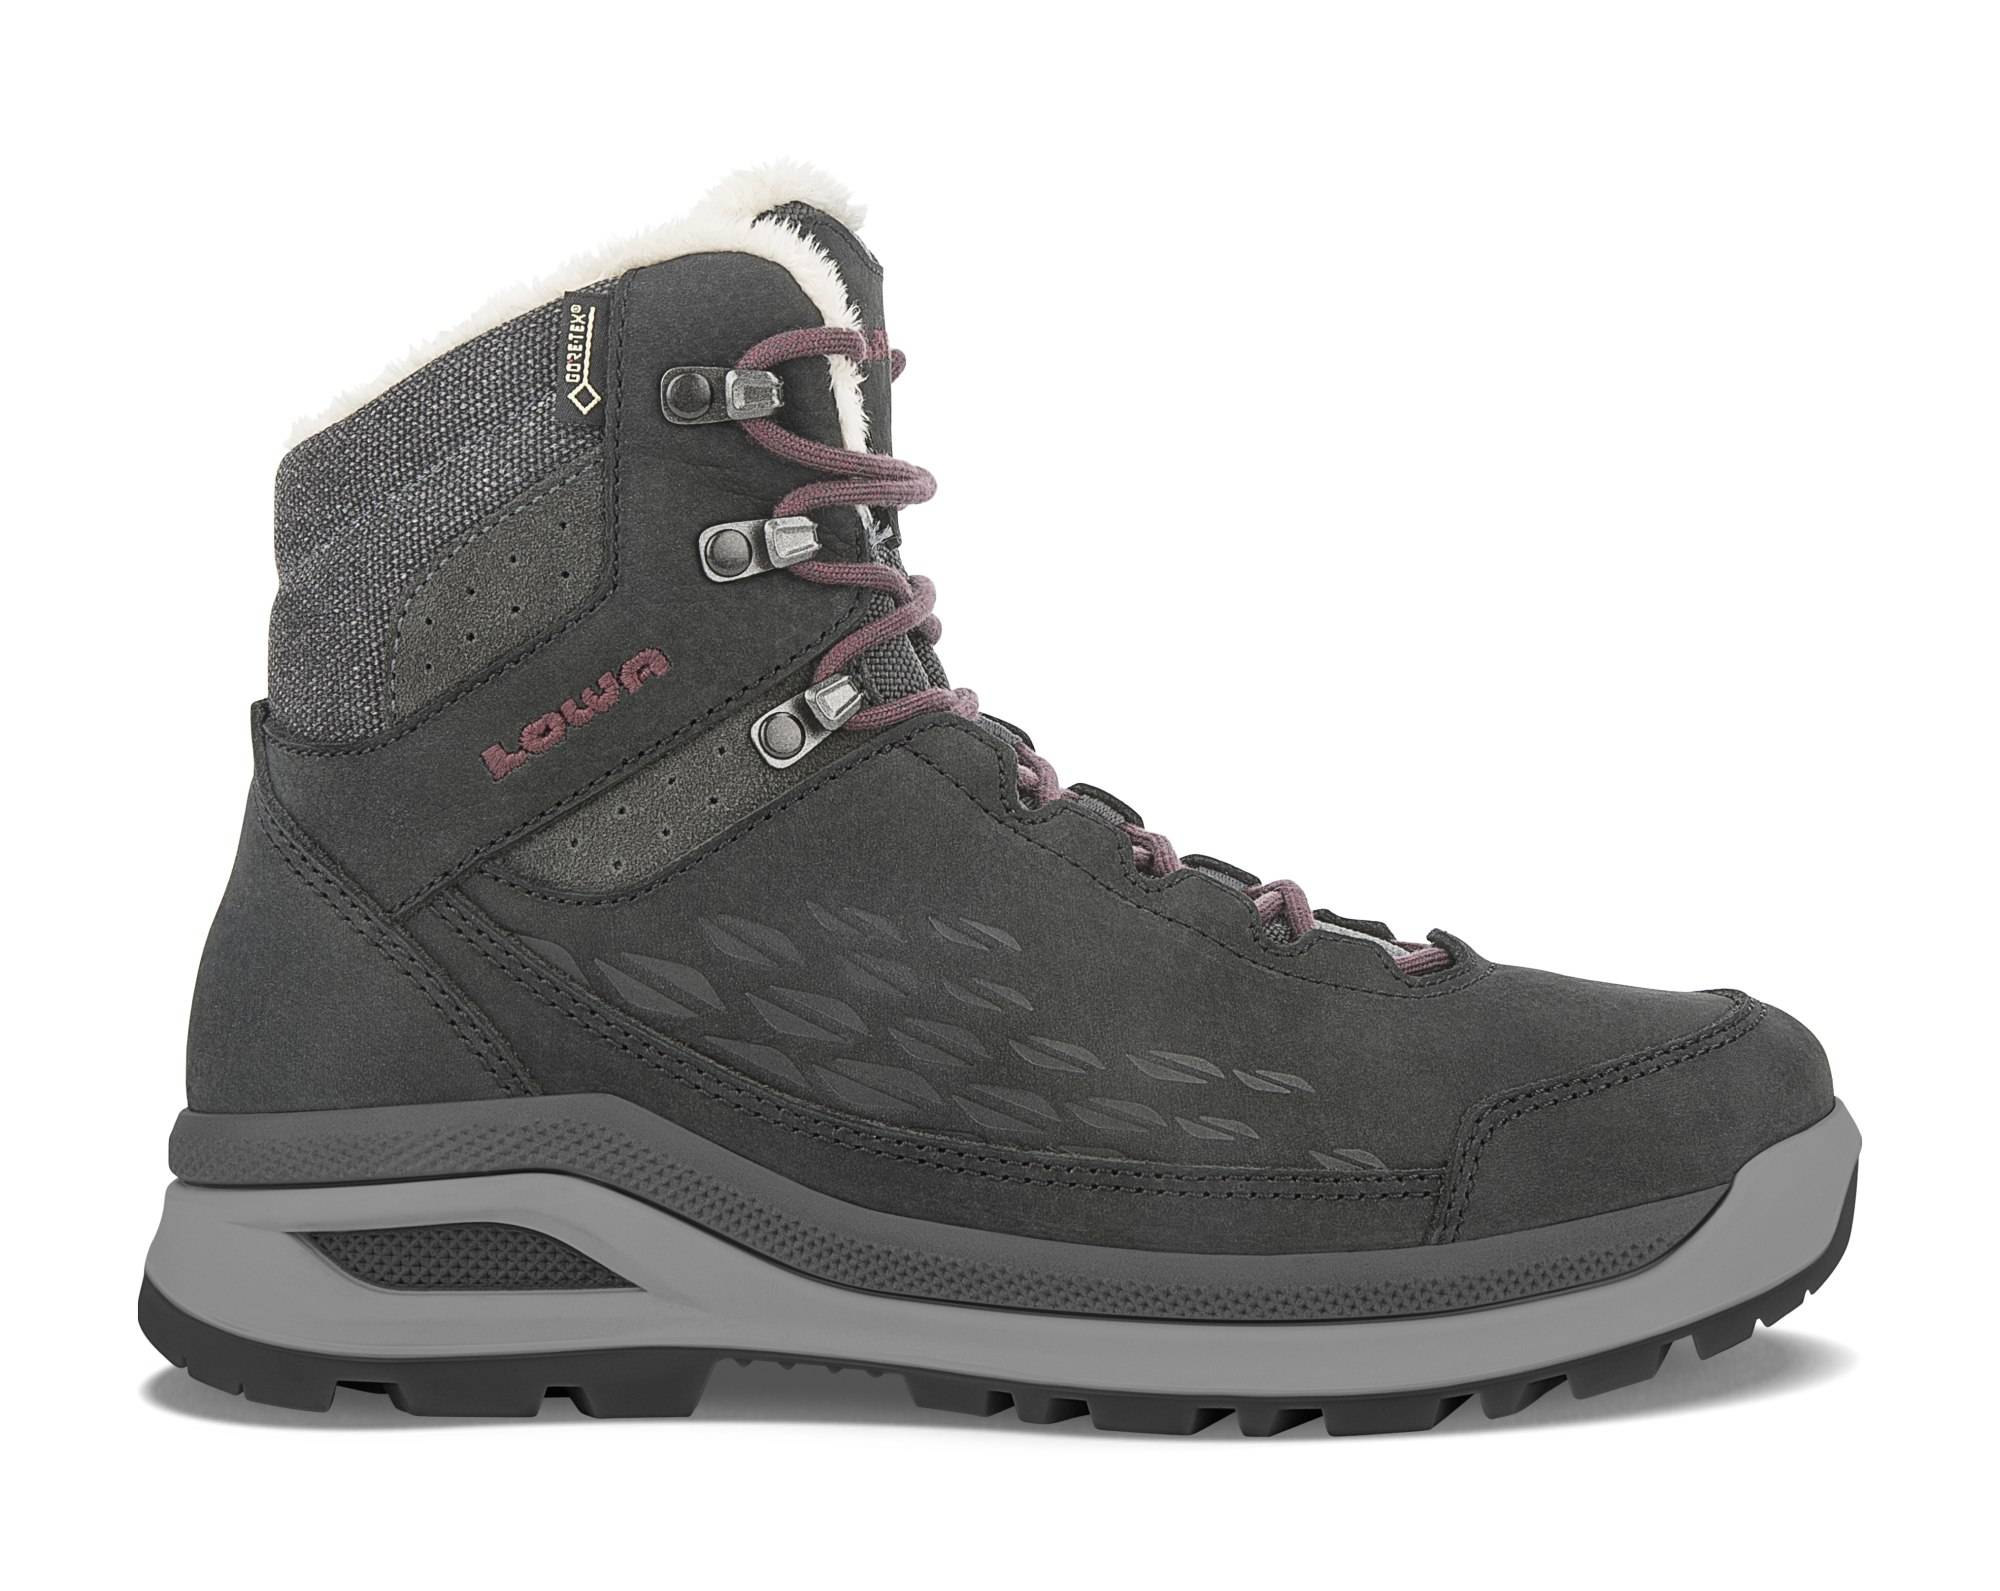 Lowa Locarno Ice GTX Mid naisten kengät